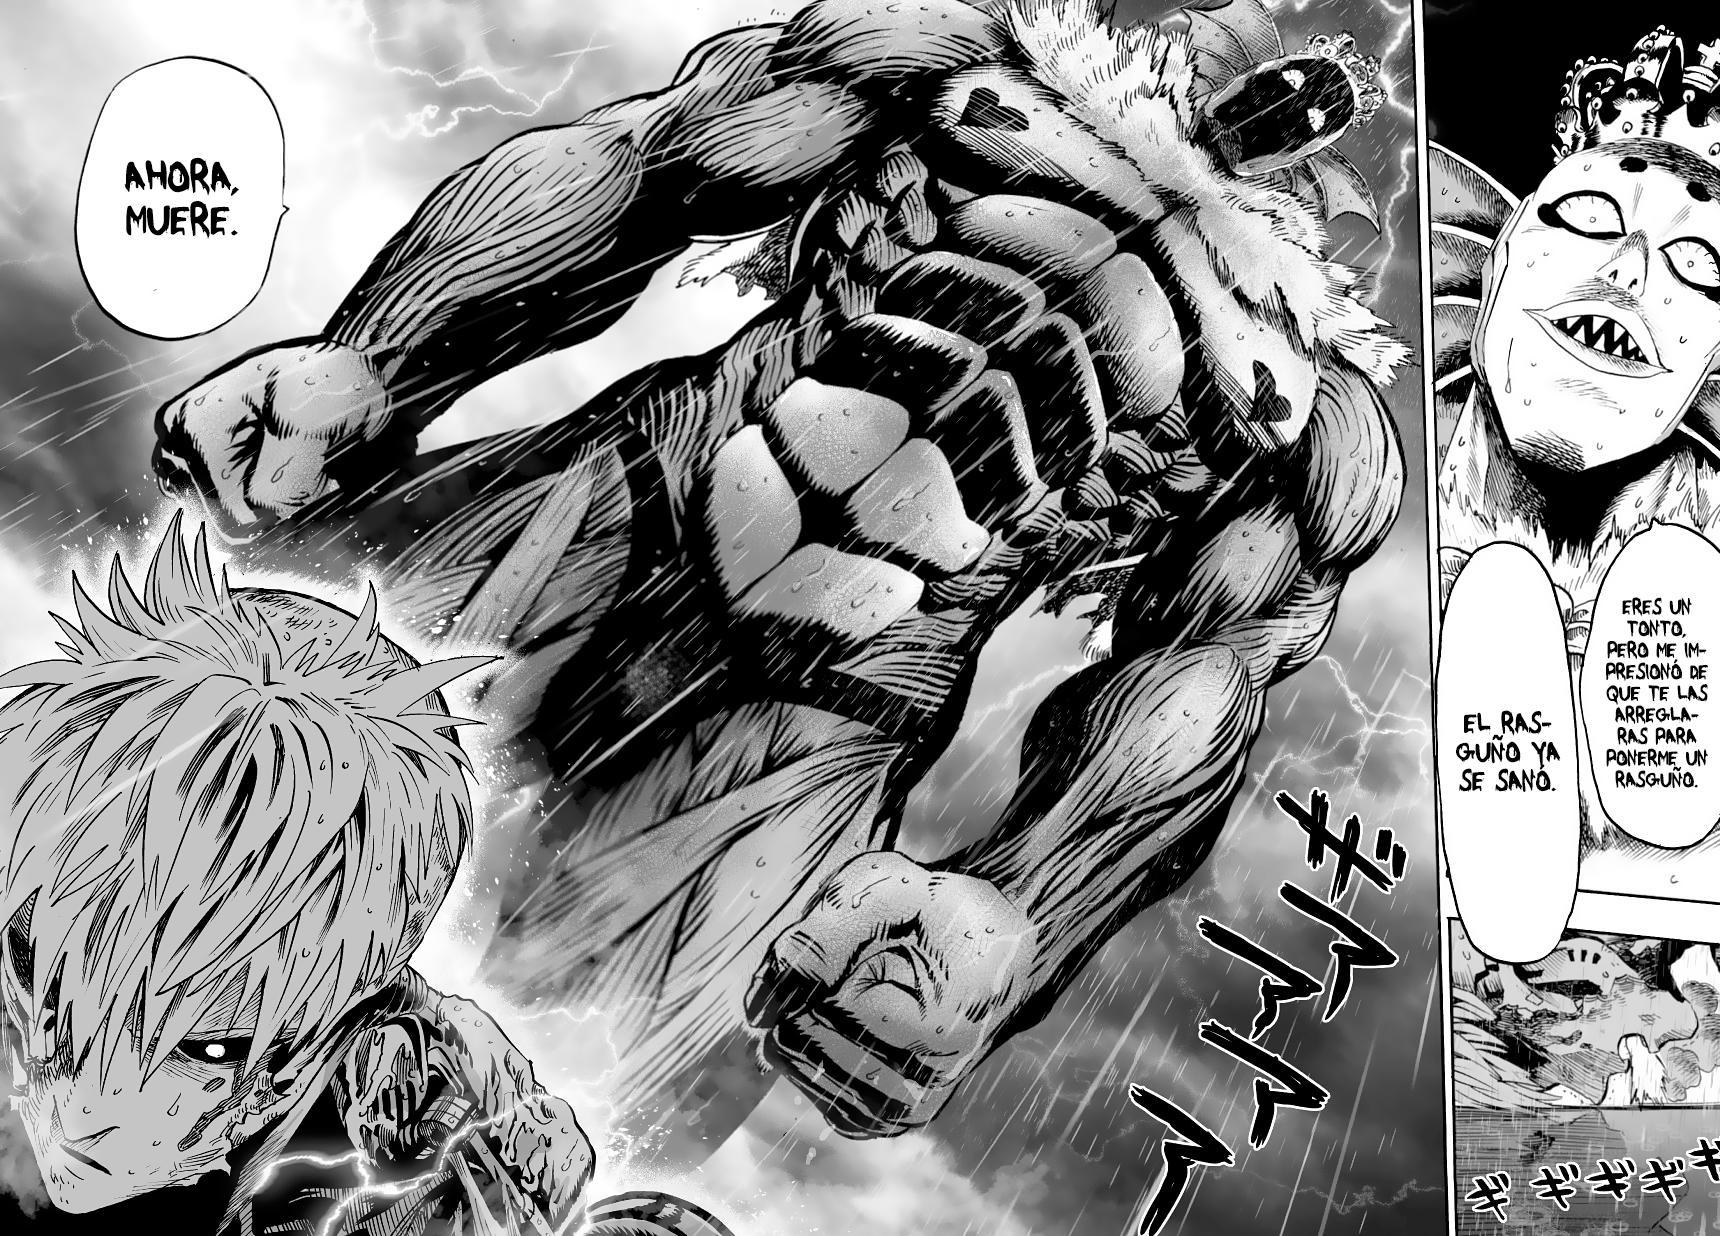 http://c5.ninemanga.com/es_manga/21/14805/362303/b9a5bb0159ab00fa62f31e5c956eac14.jpg Page 10